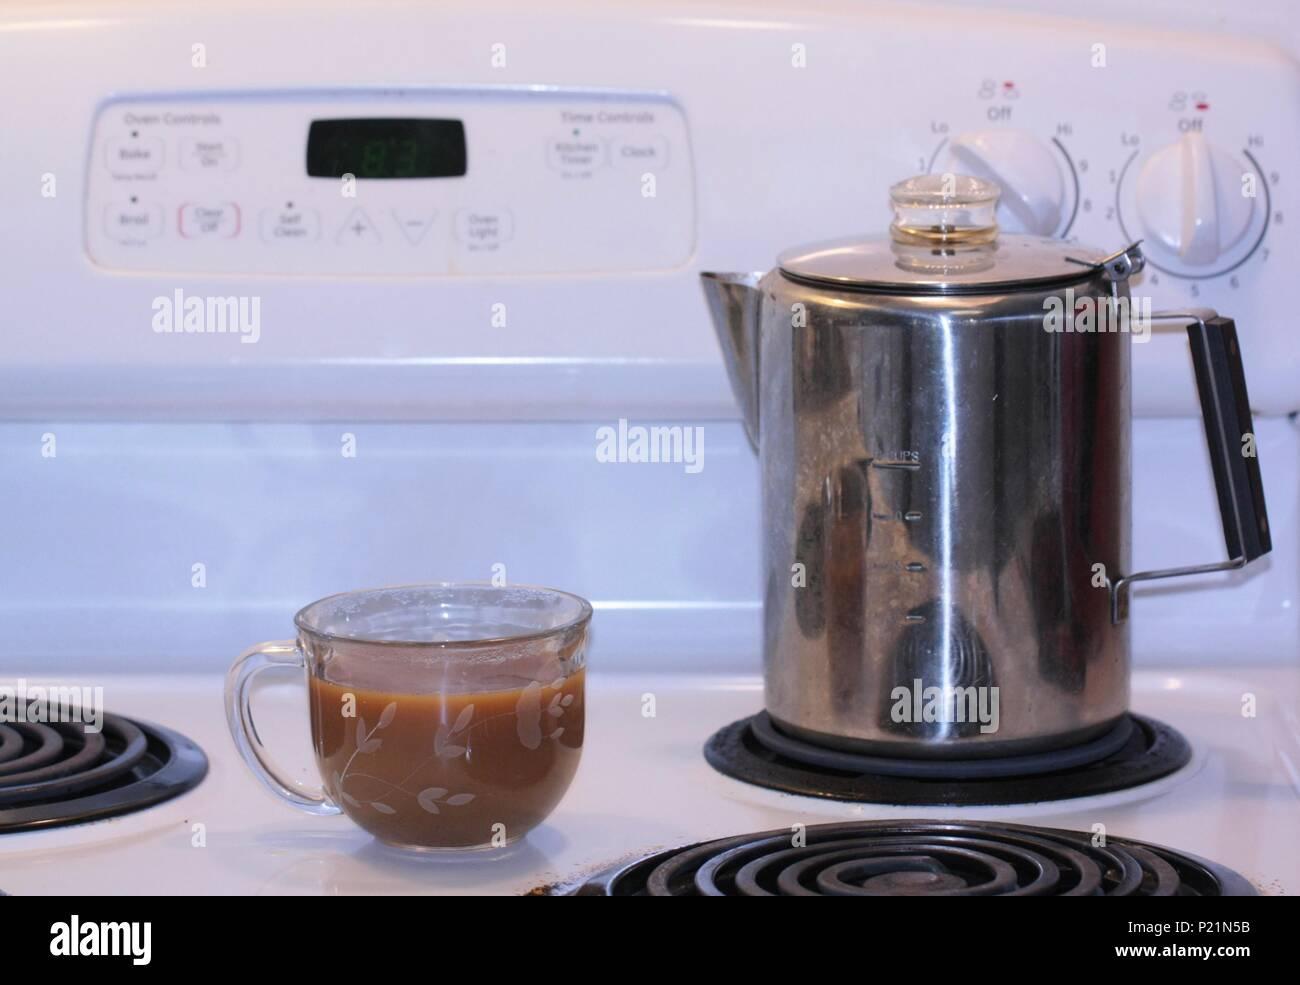 Hot Perked Coffee - Stock Image